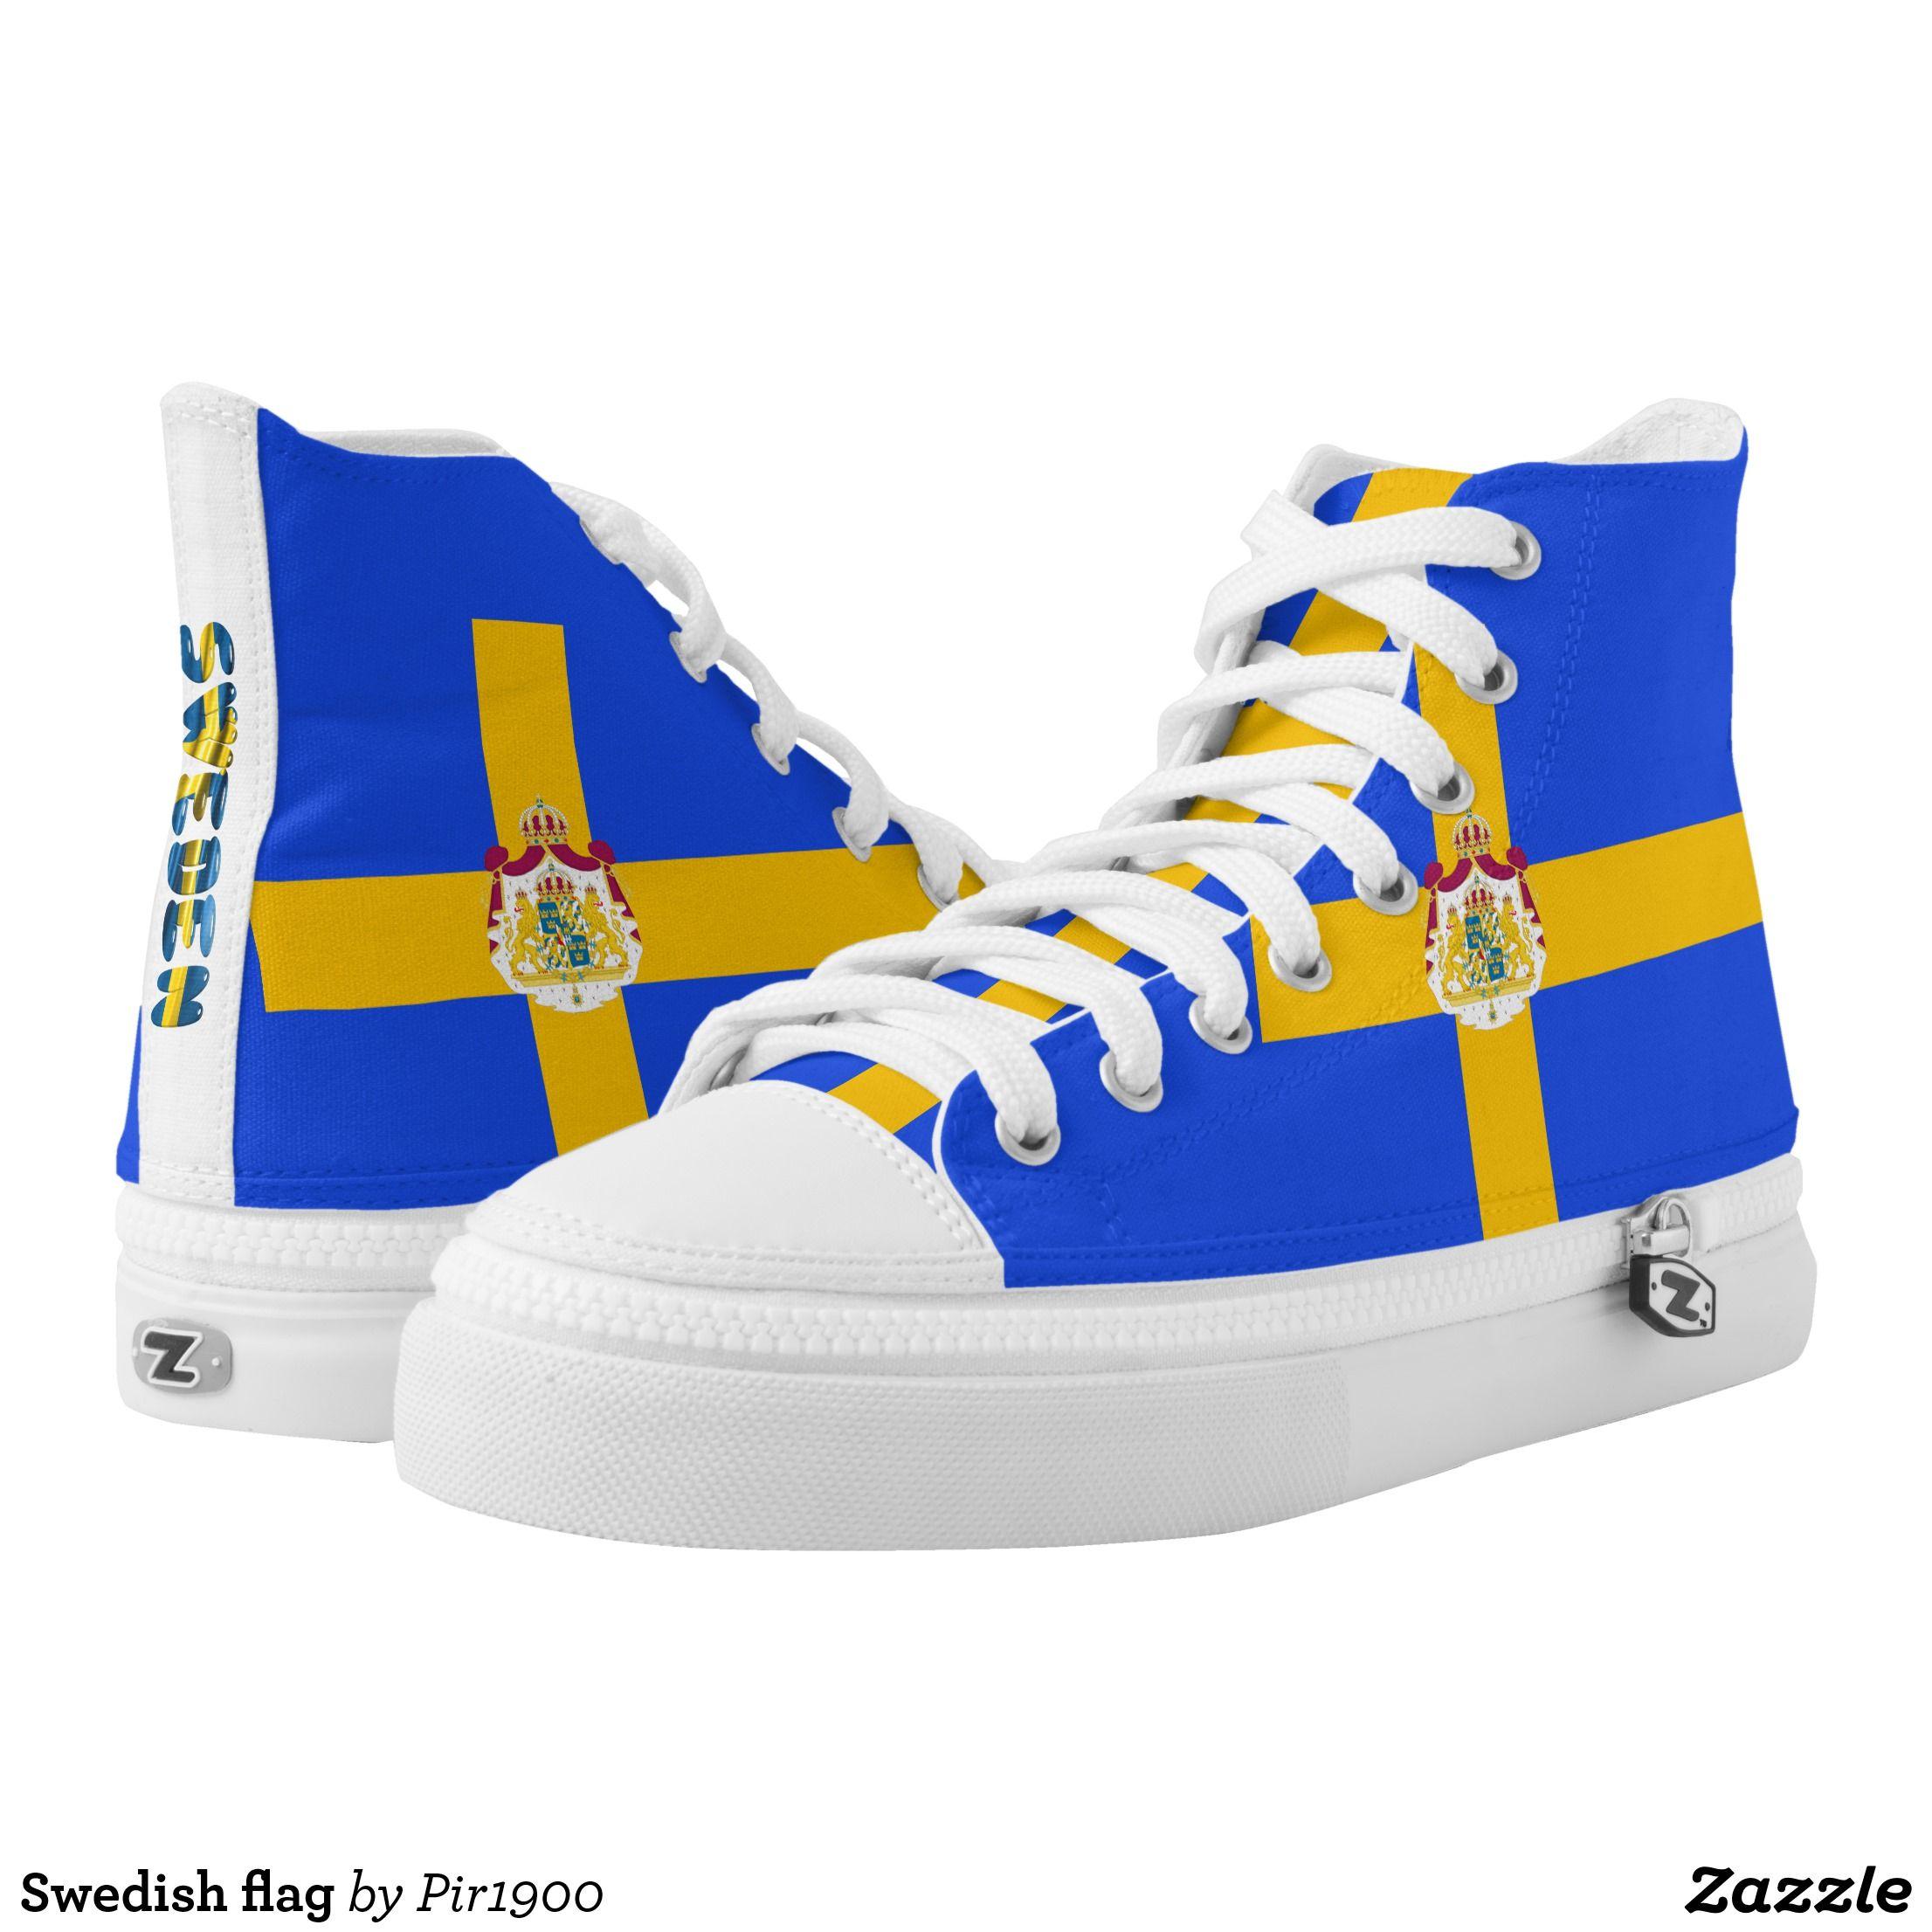 Swedish Flag High Top Sneakers Zazzle Com High Top Sneakers Sneakers Fashion High Tops